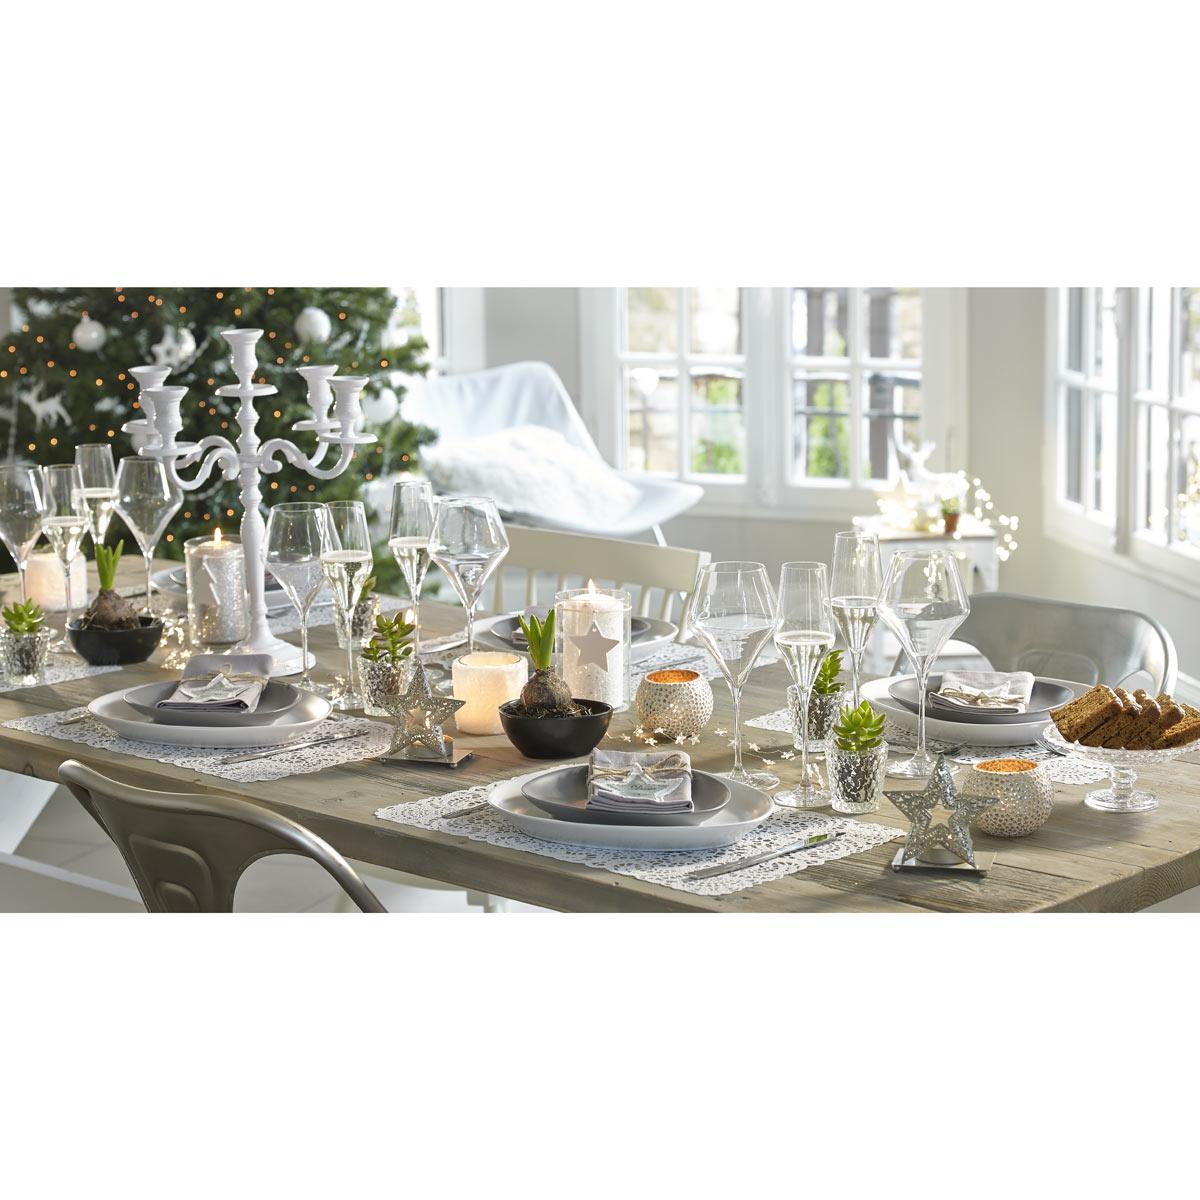 mesa decorada de forma romantica